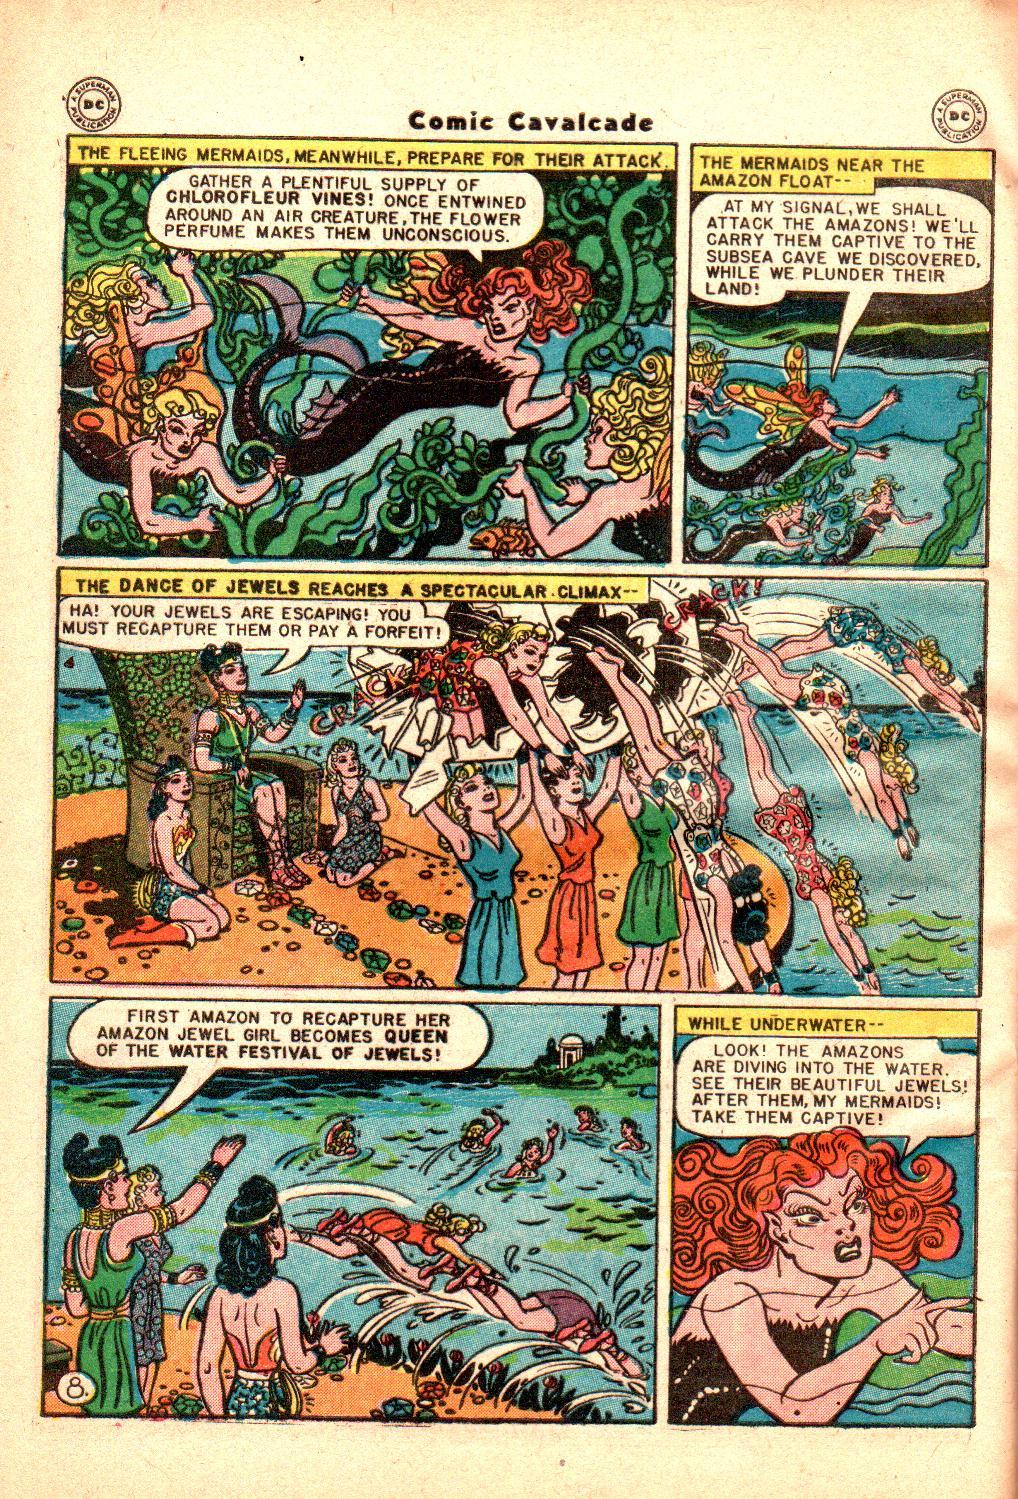 Comic Cavalcade issue 21 - Page 10